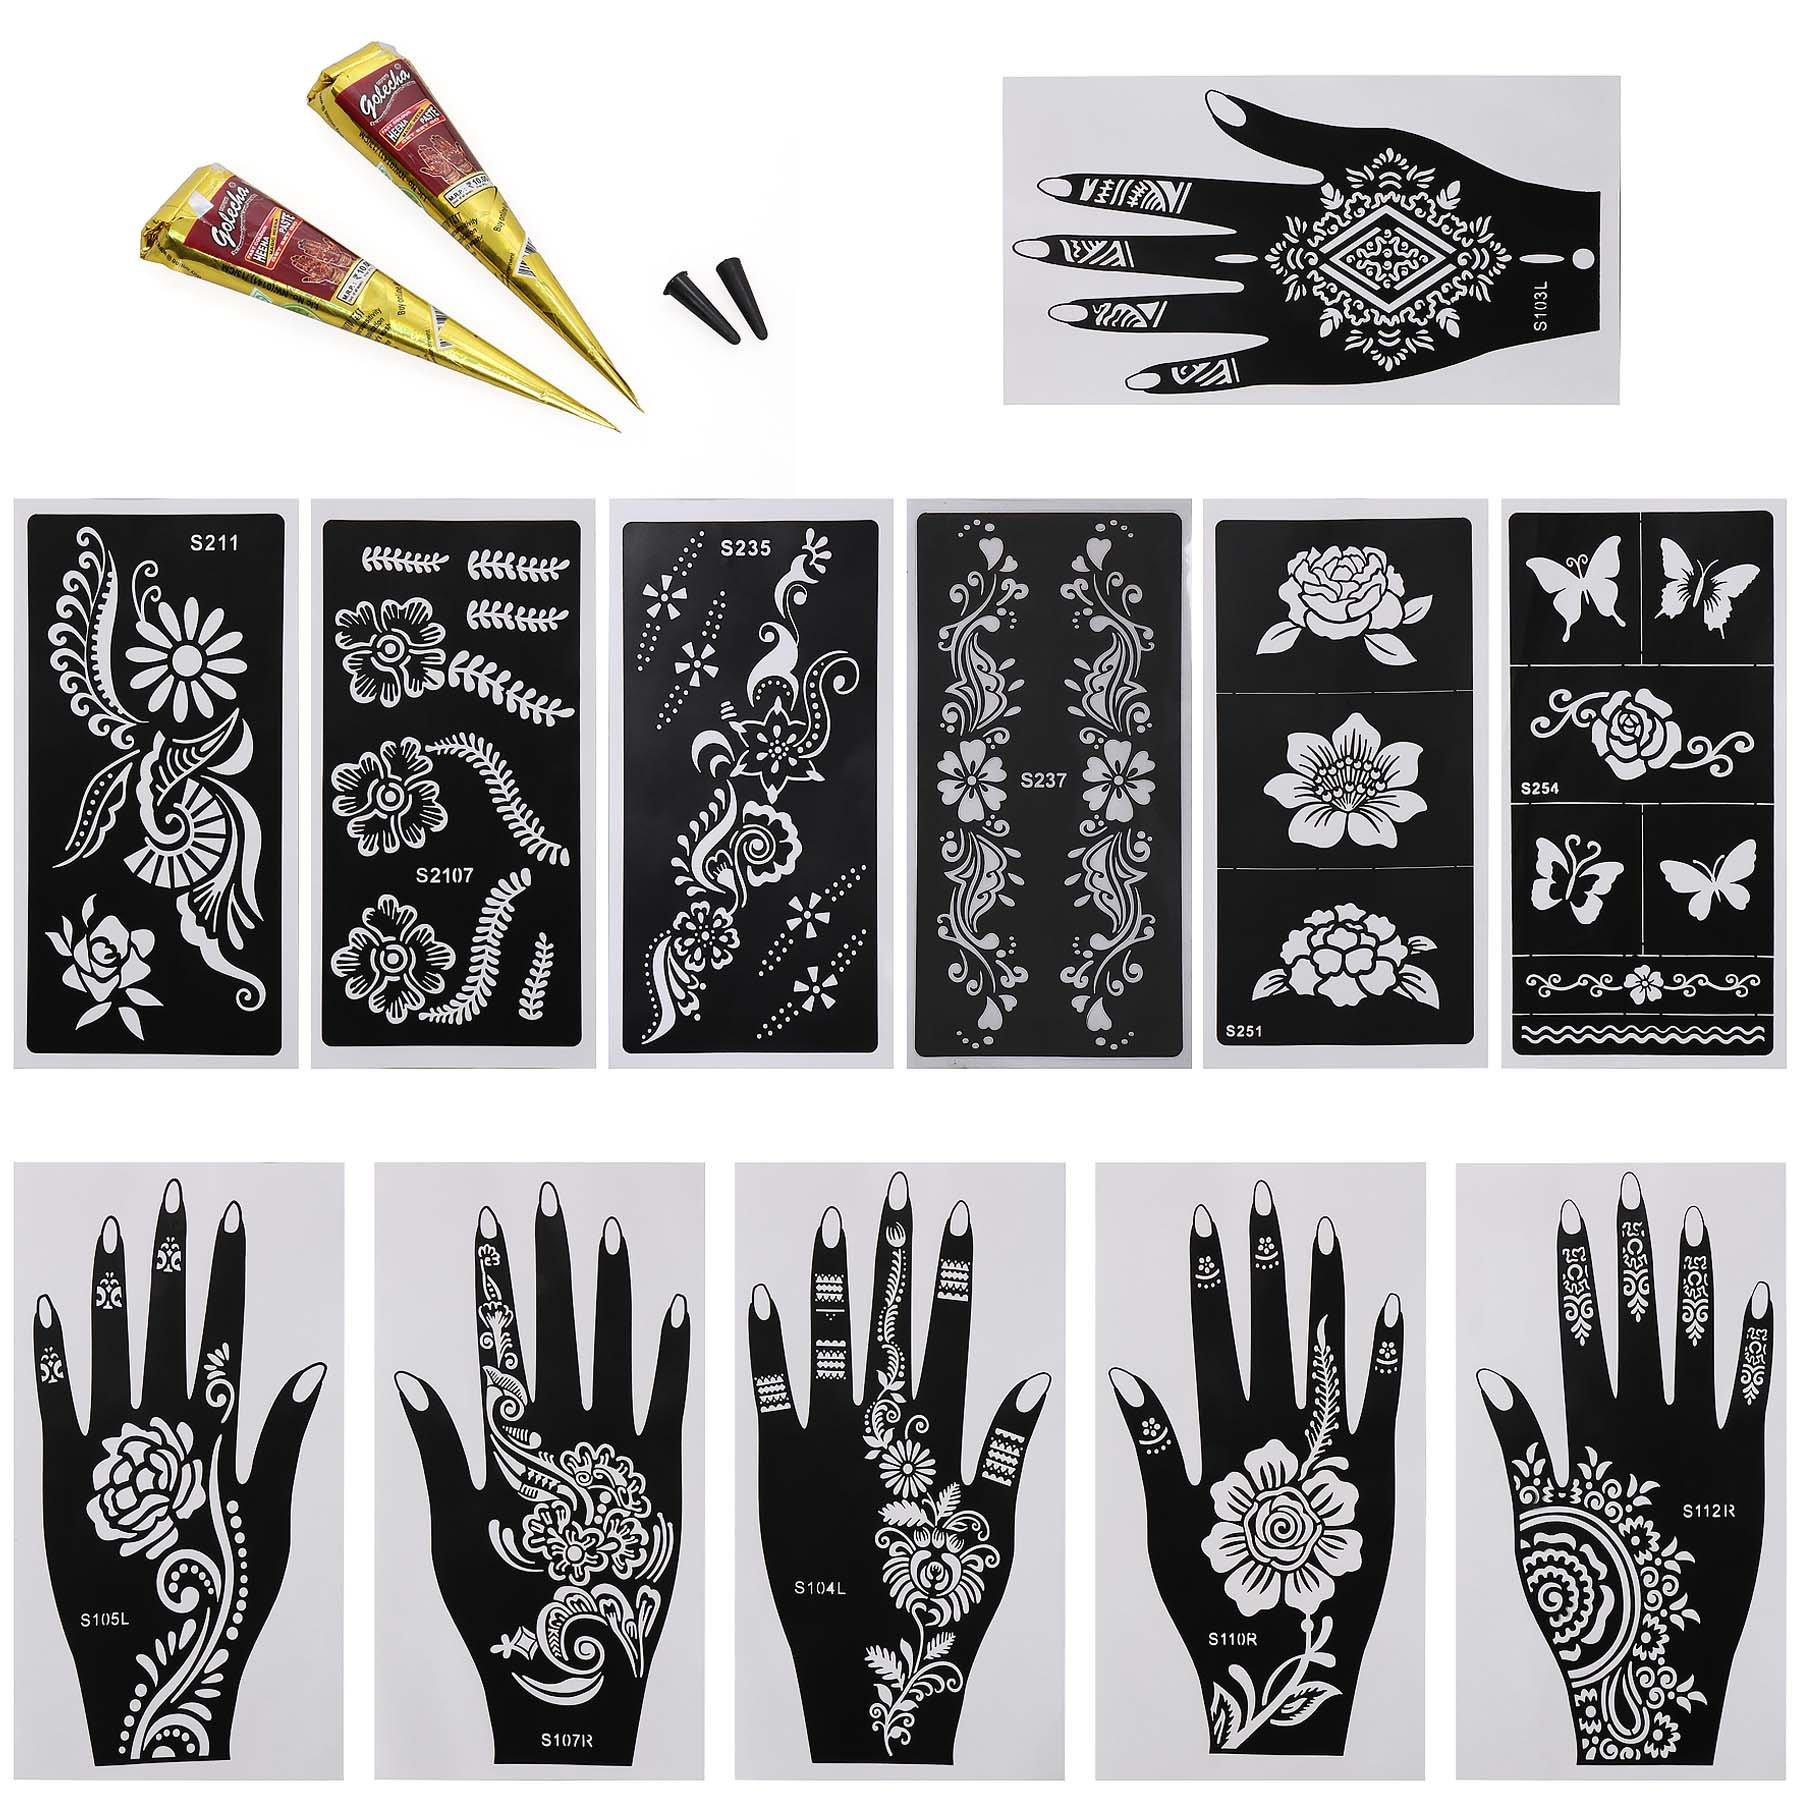 d80a28a57 Get Quotations · BMC 14pc Mehndi Henna Tattoo Body Art Starter Kit - 2  Color Cones w/ 12